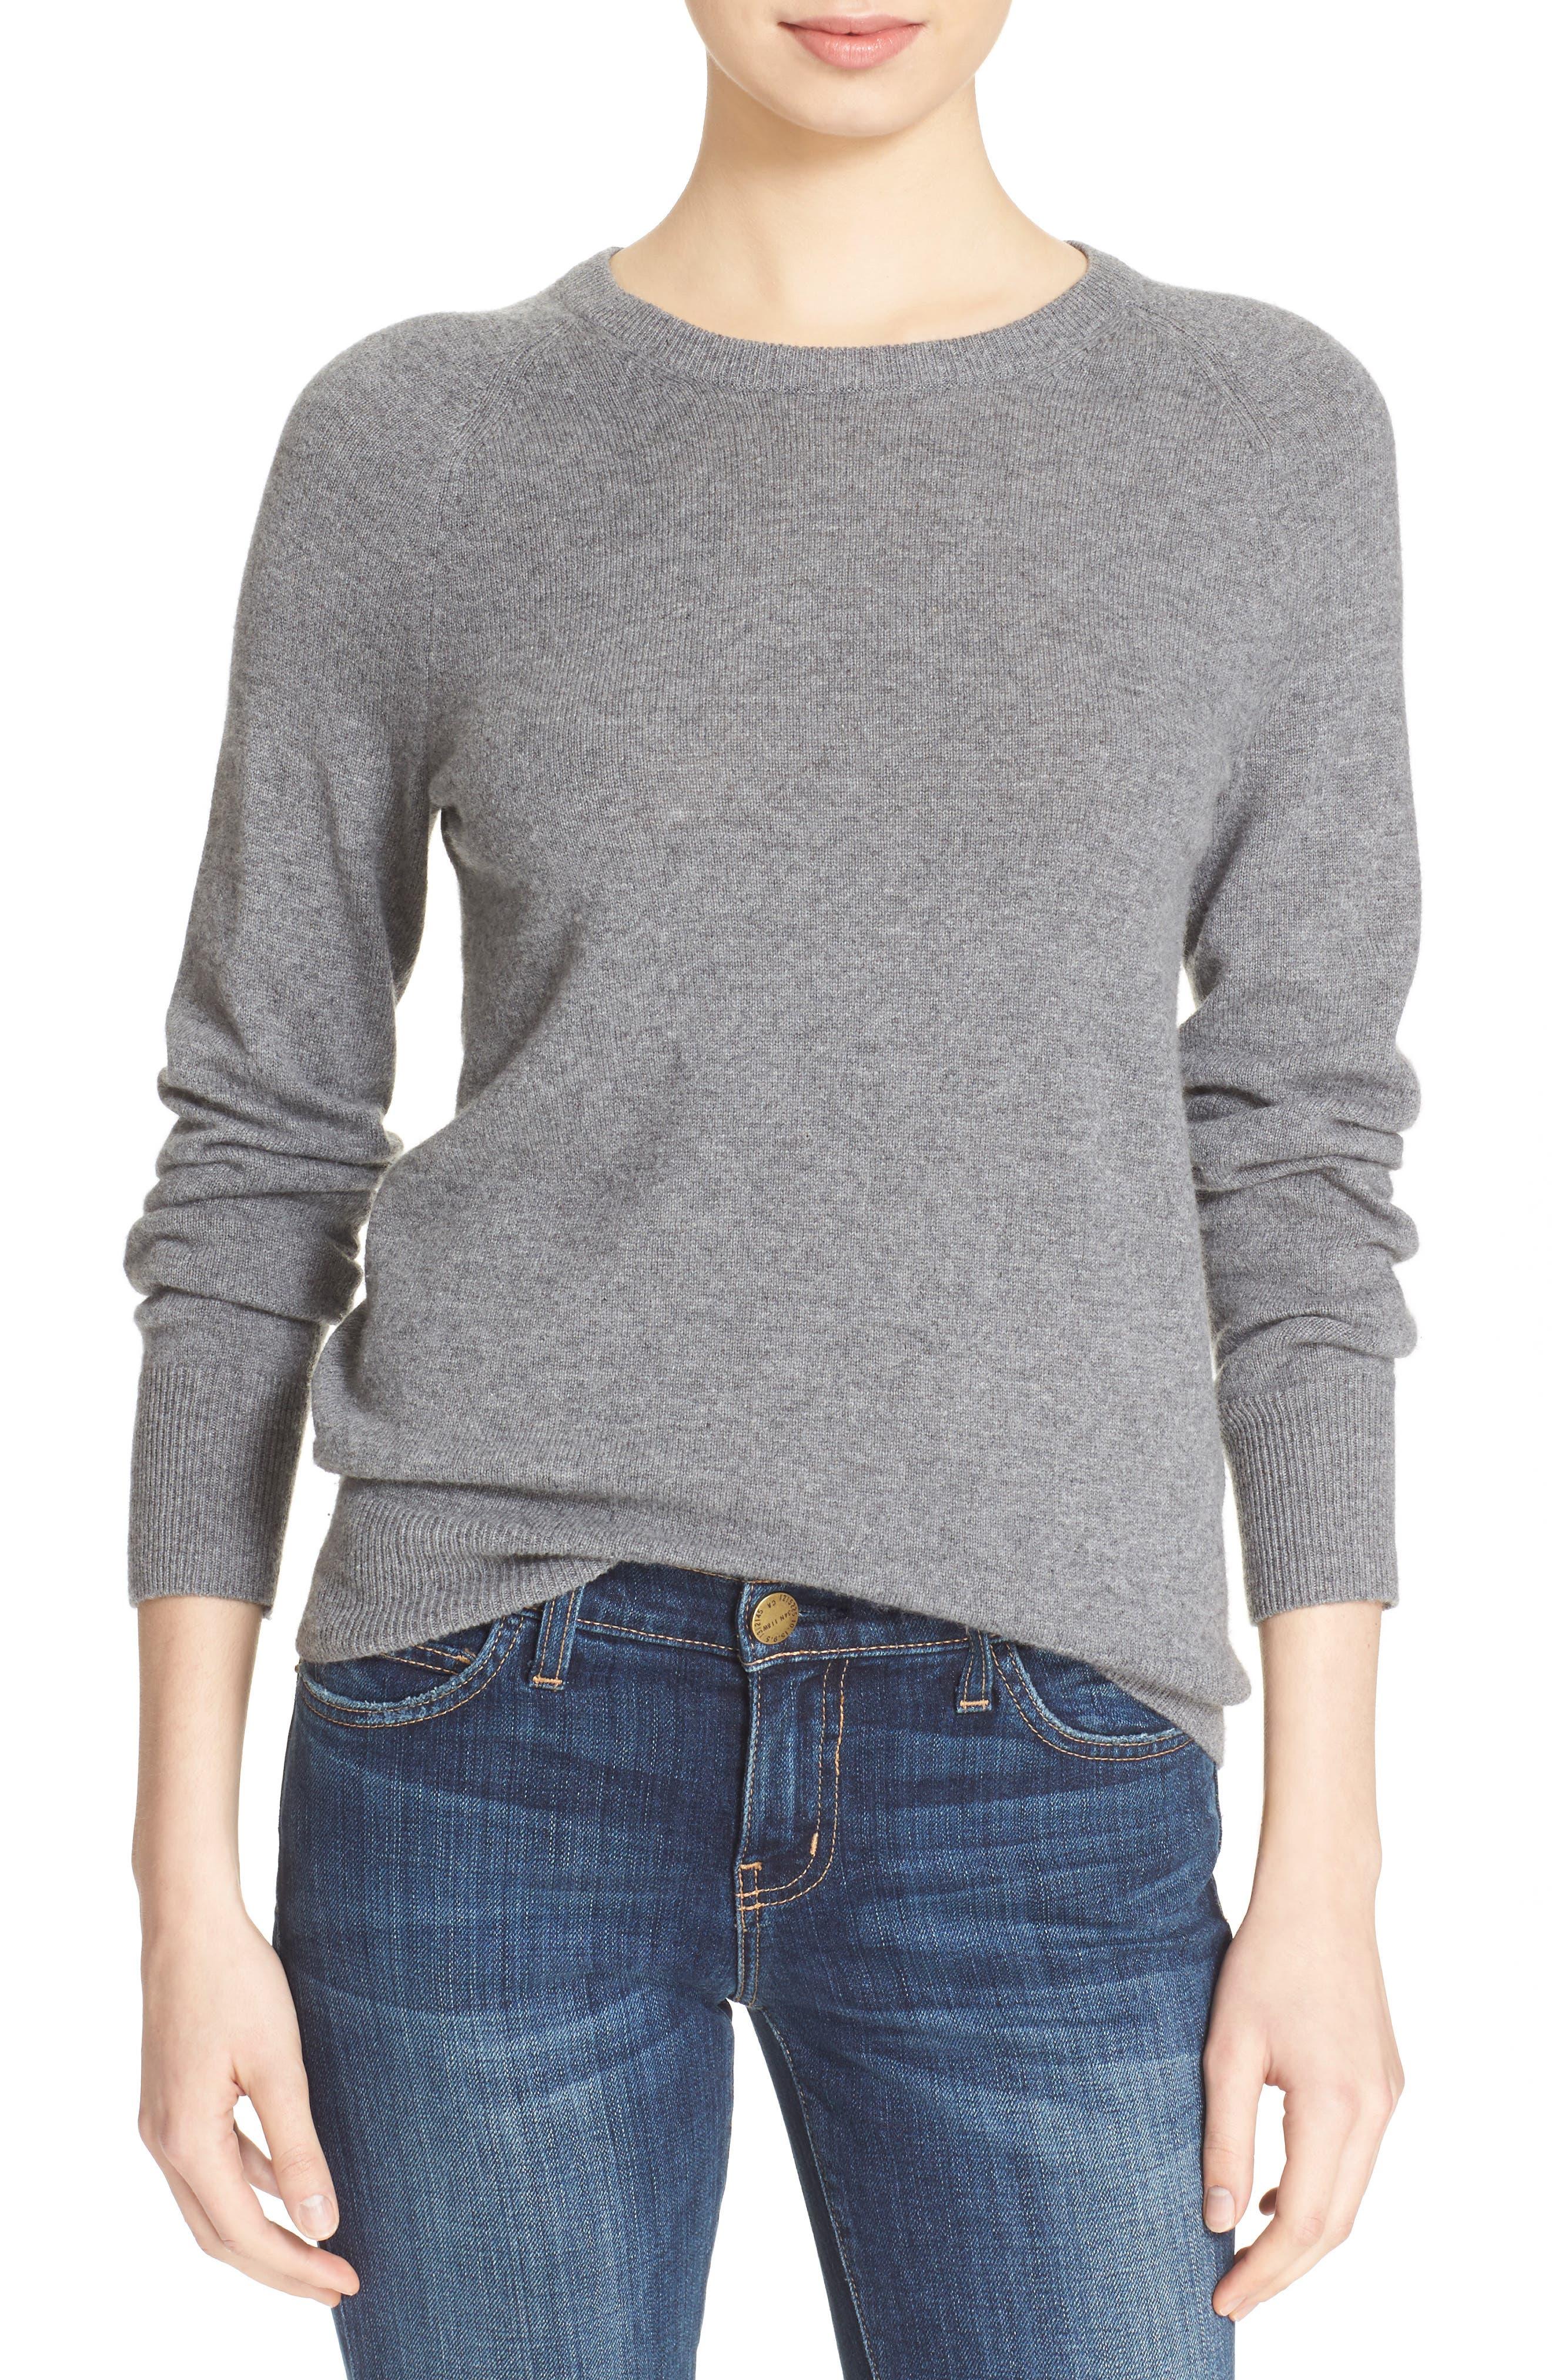 EQUIPMENT, 'Sloane' Crewneck Cashmere Sweater, Alternate thumbnail 6, color, 021